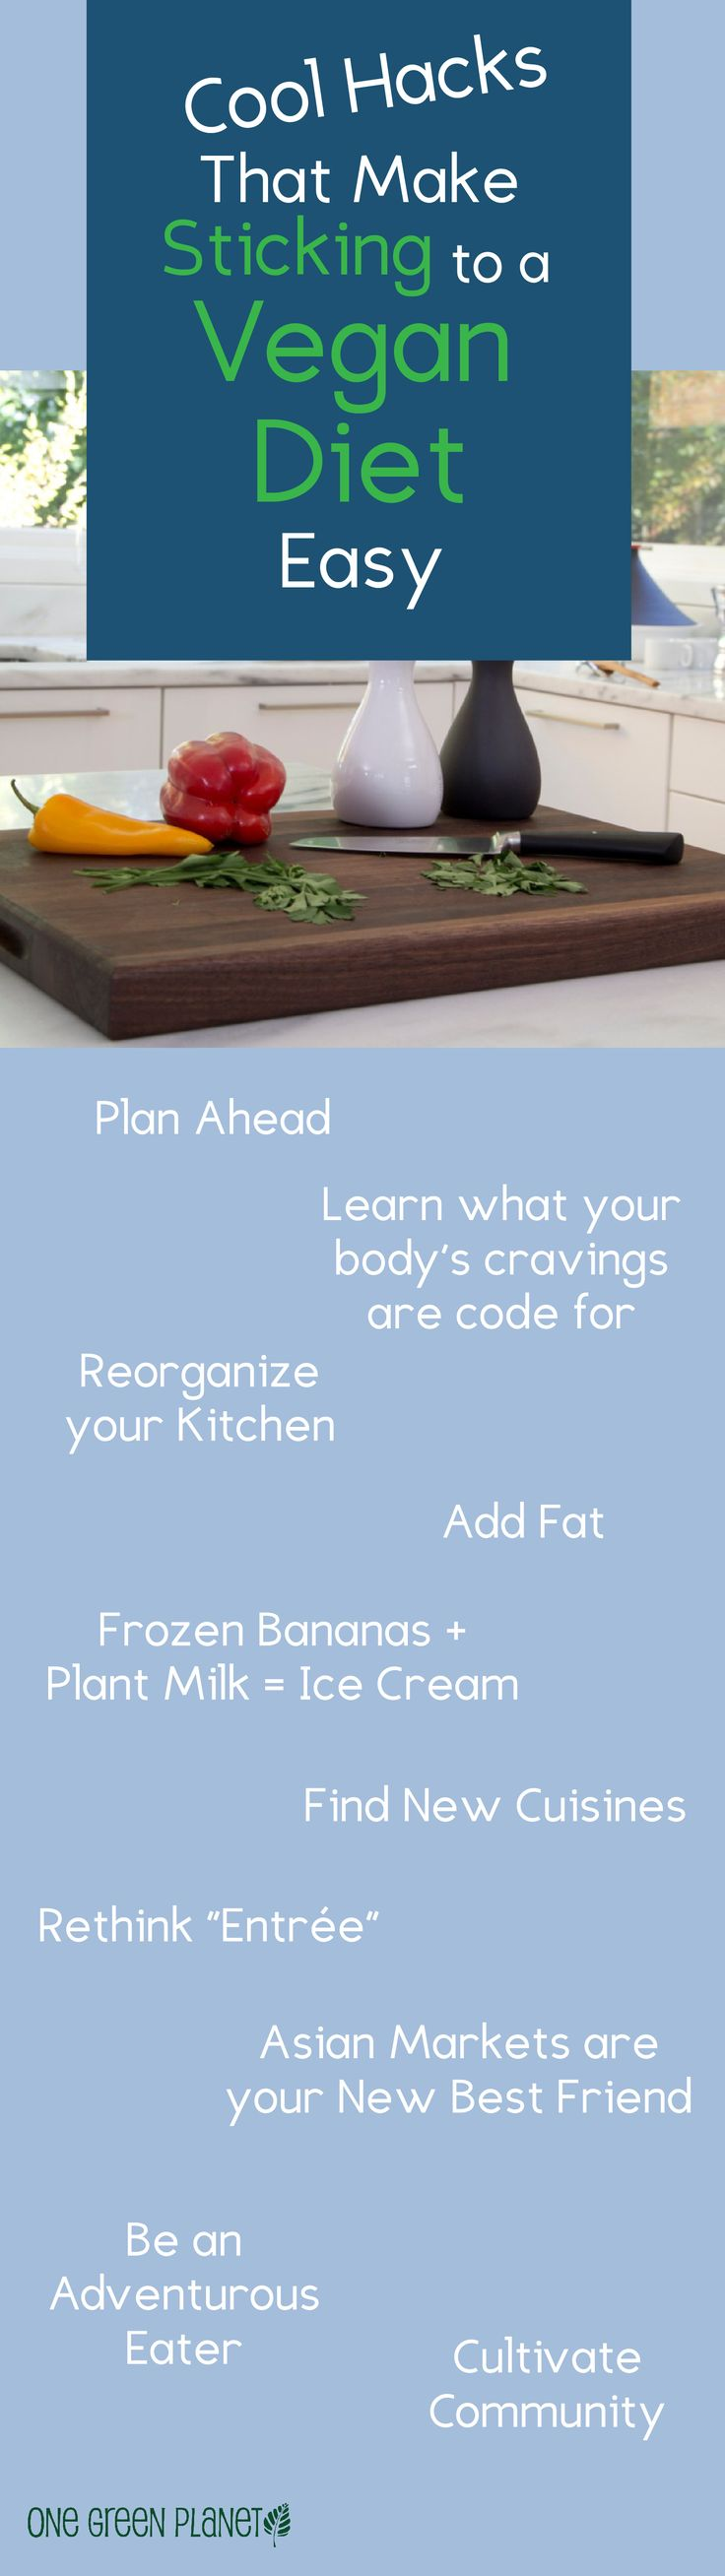 Here's a few great ideas for sticking to a vegan diet! #MyVeganJournal http://www.myveganjournal.com